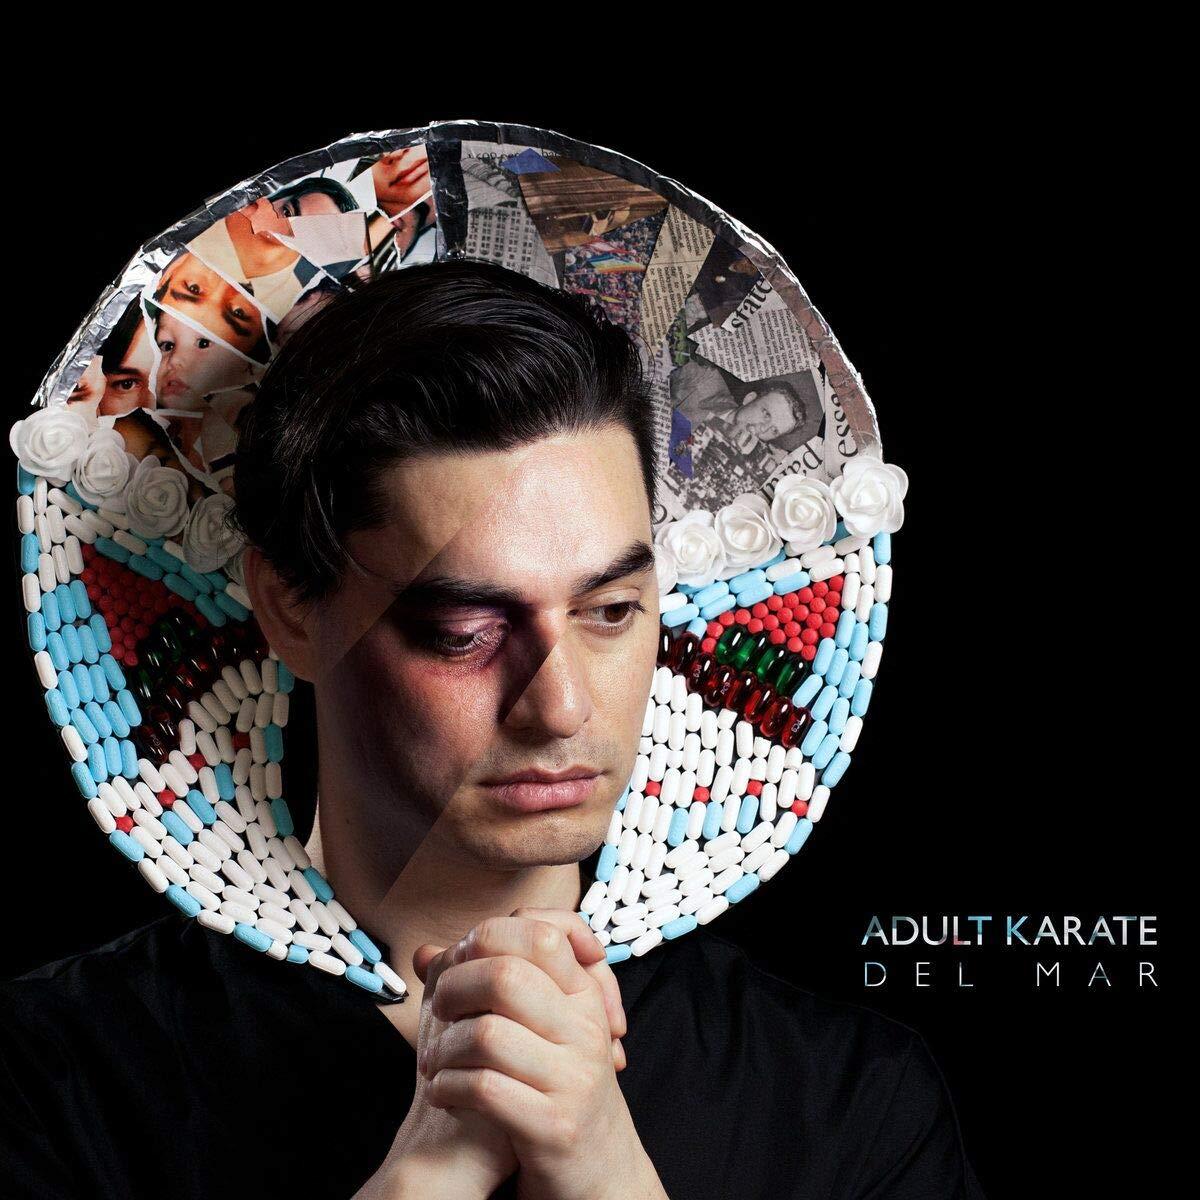 Vinilo : Adult Karate - Del Mar (clear Vinyl) (Clear Vinyl)